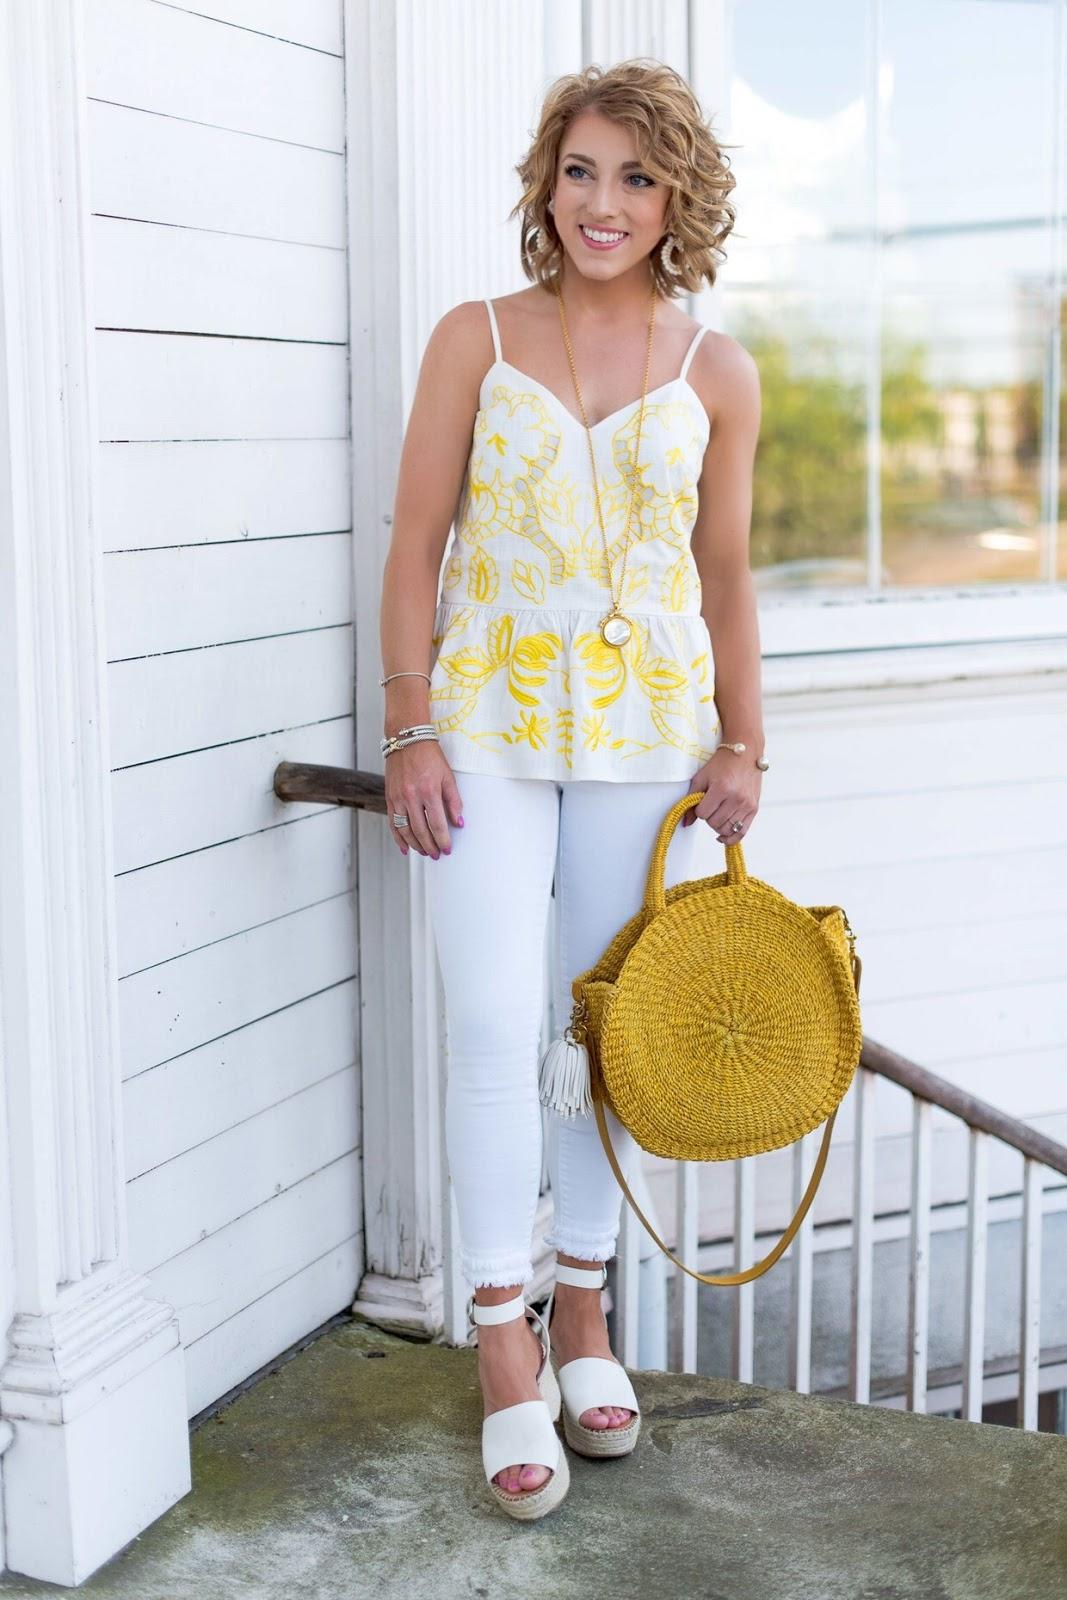 Yellow Details Cutwork Cami (Under $60) + Clare V. Alice Bag - Something Delightful Blog